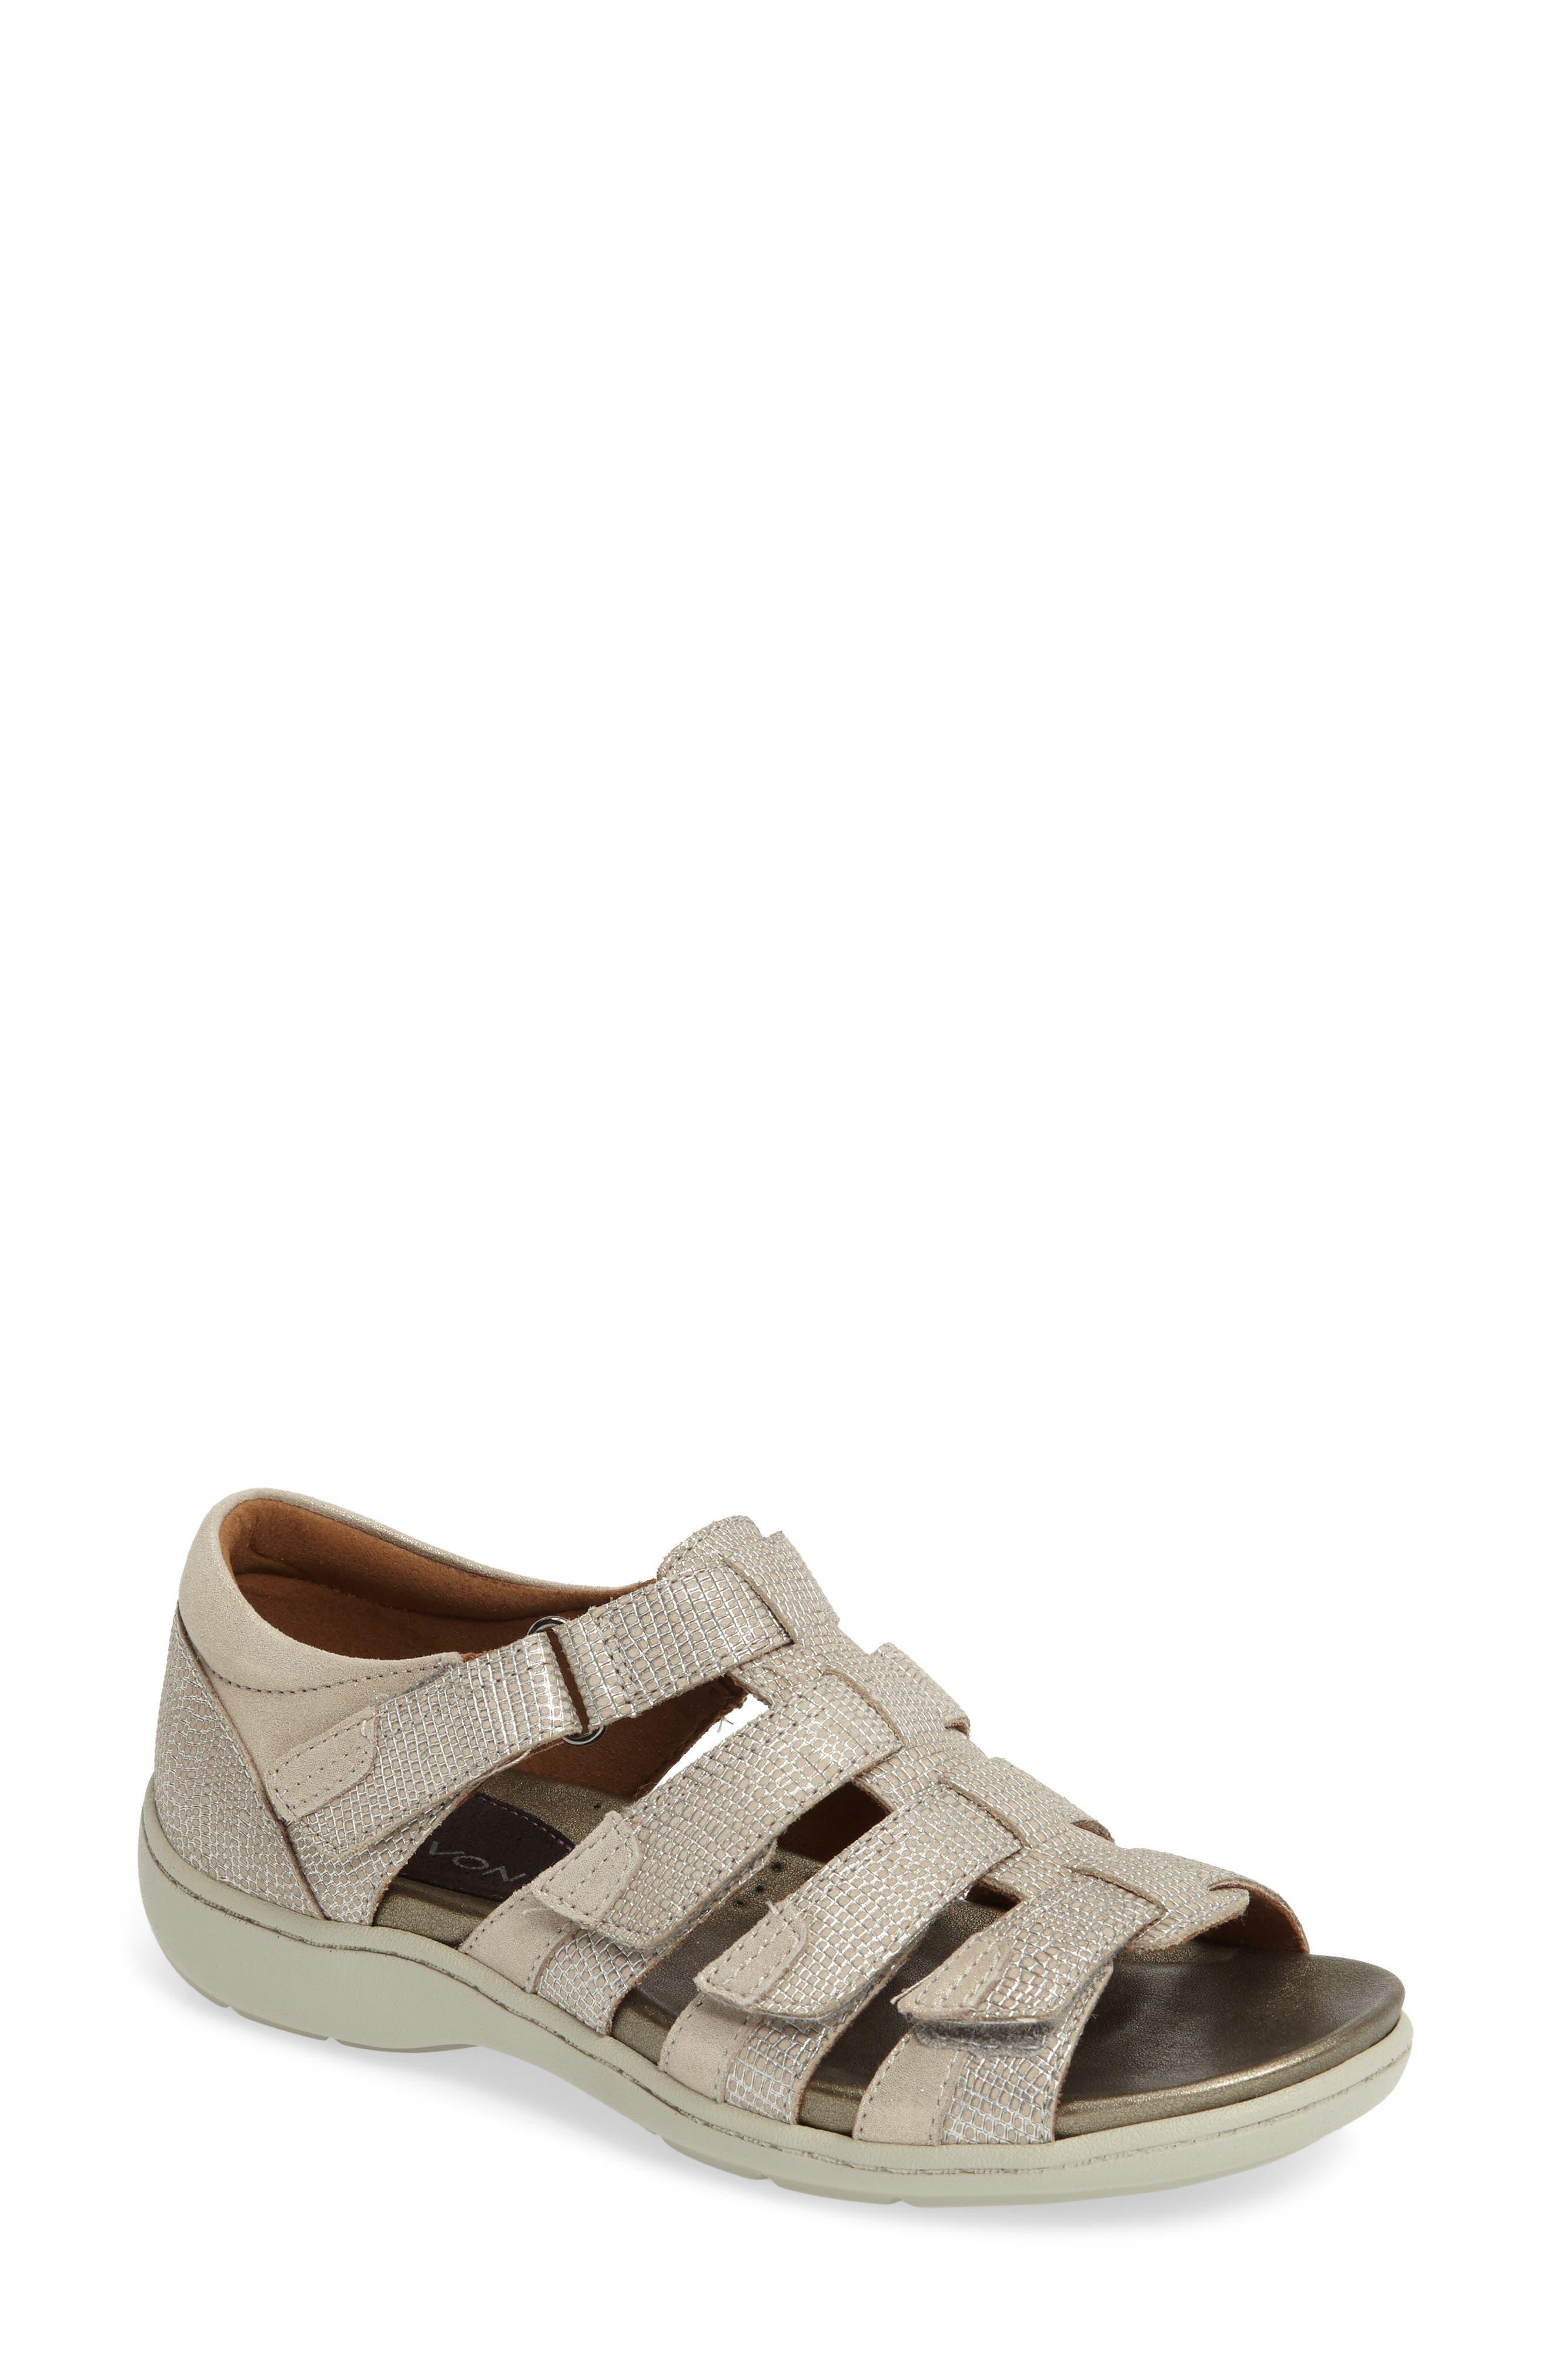 Bromly Sandal,                         Main,                         color, 232